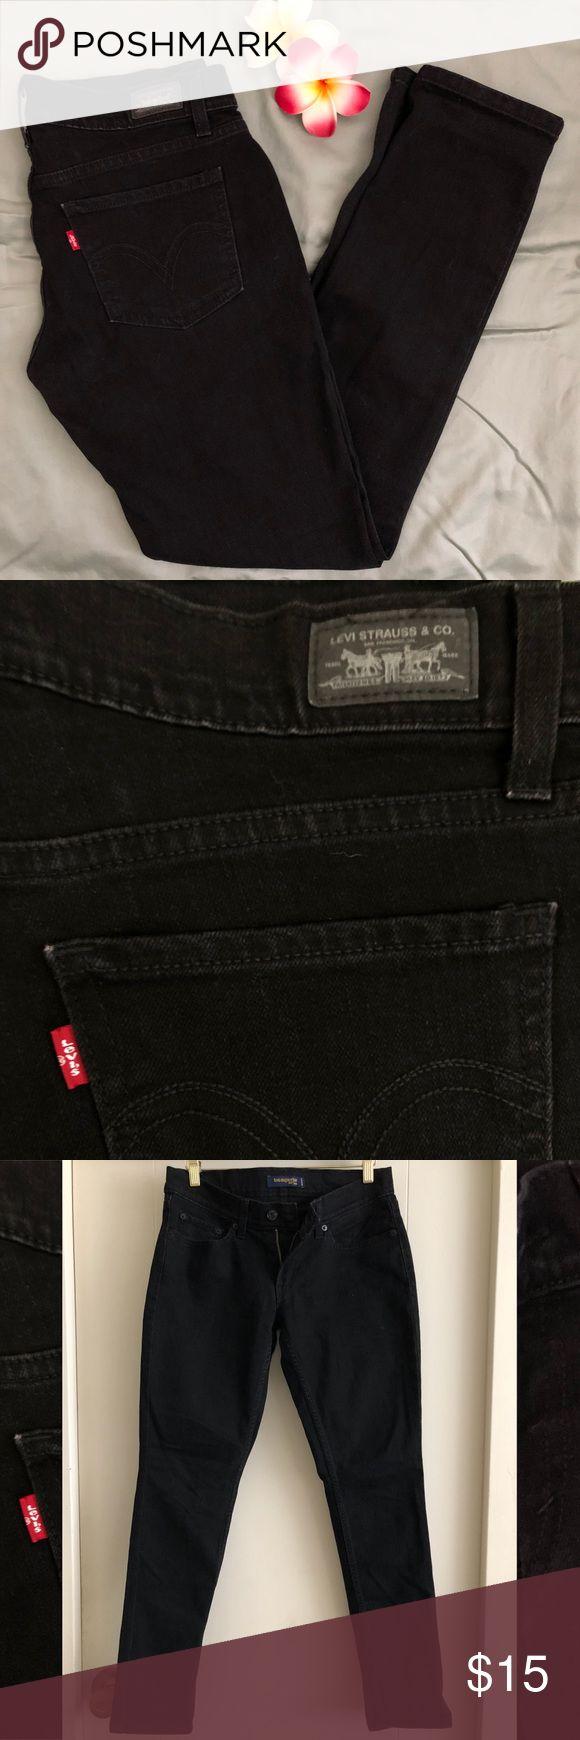 Skinny Black Too Super Low Levi's Women's Skinny Black Too Super Low Levi's jeans. Size 7. Low cut jeans. Open to offers. Levi's Jeans Skinny